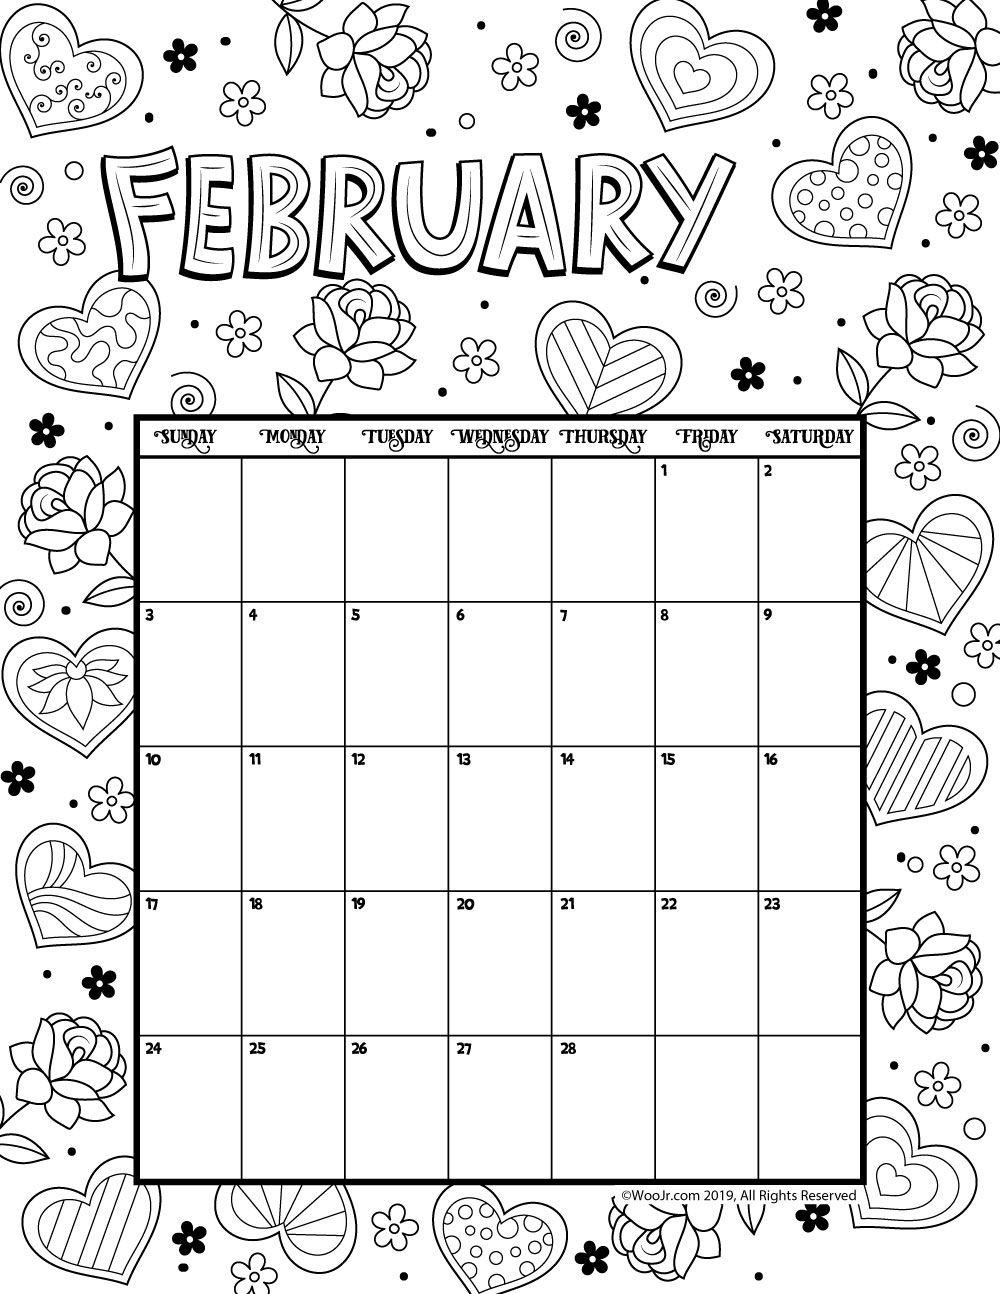 February Activities Calendar 2019 February 2019 Coloring Calendar | Free printables | Kids calendar